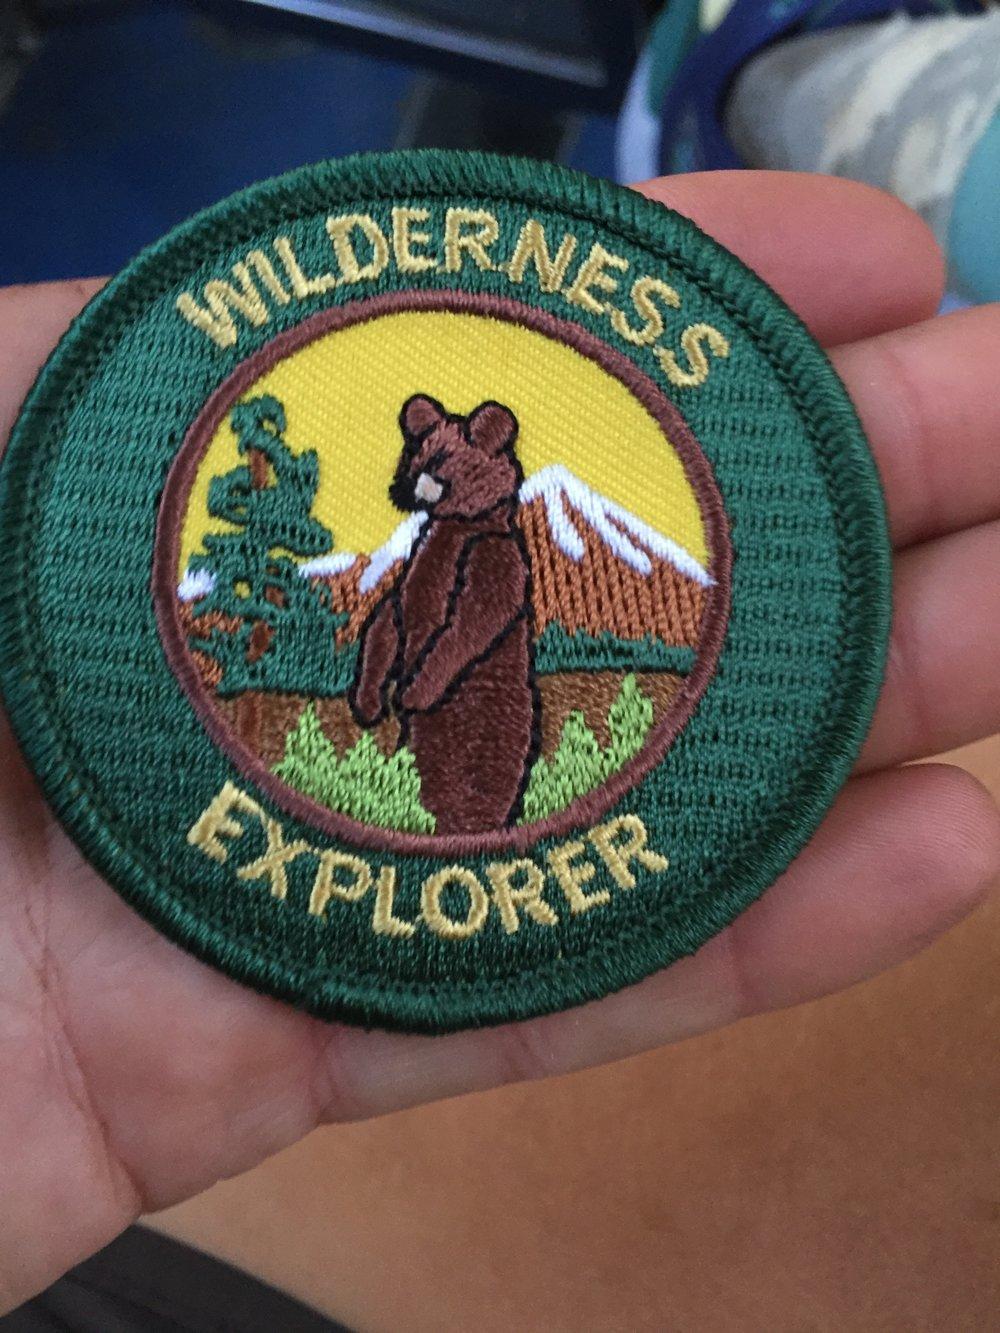 I even got another Junior Ranger badge!